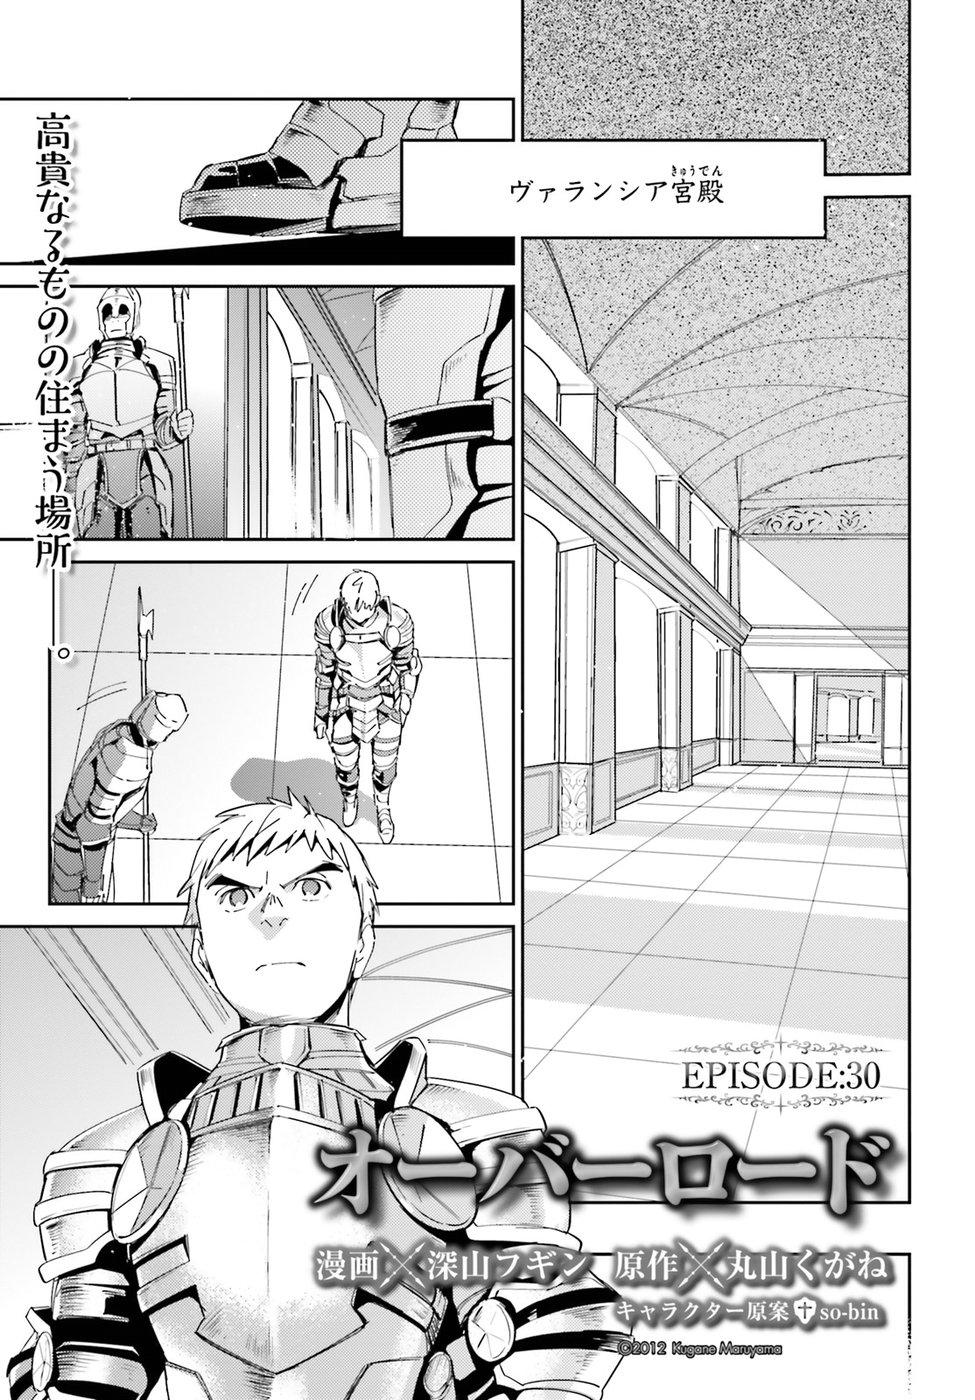 Overlord Manga Chapter 30